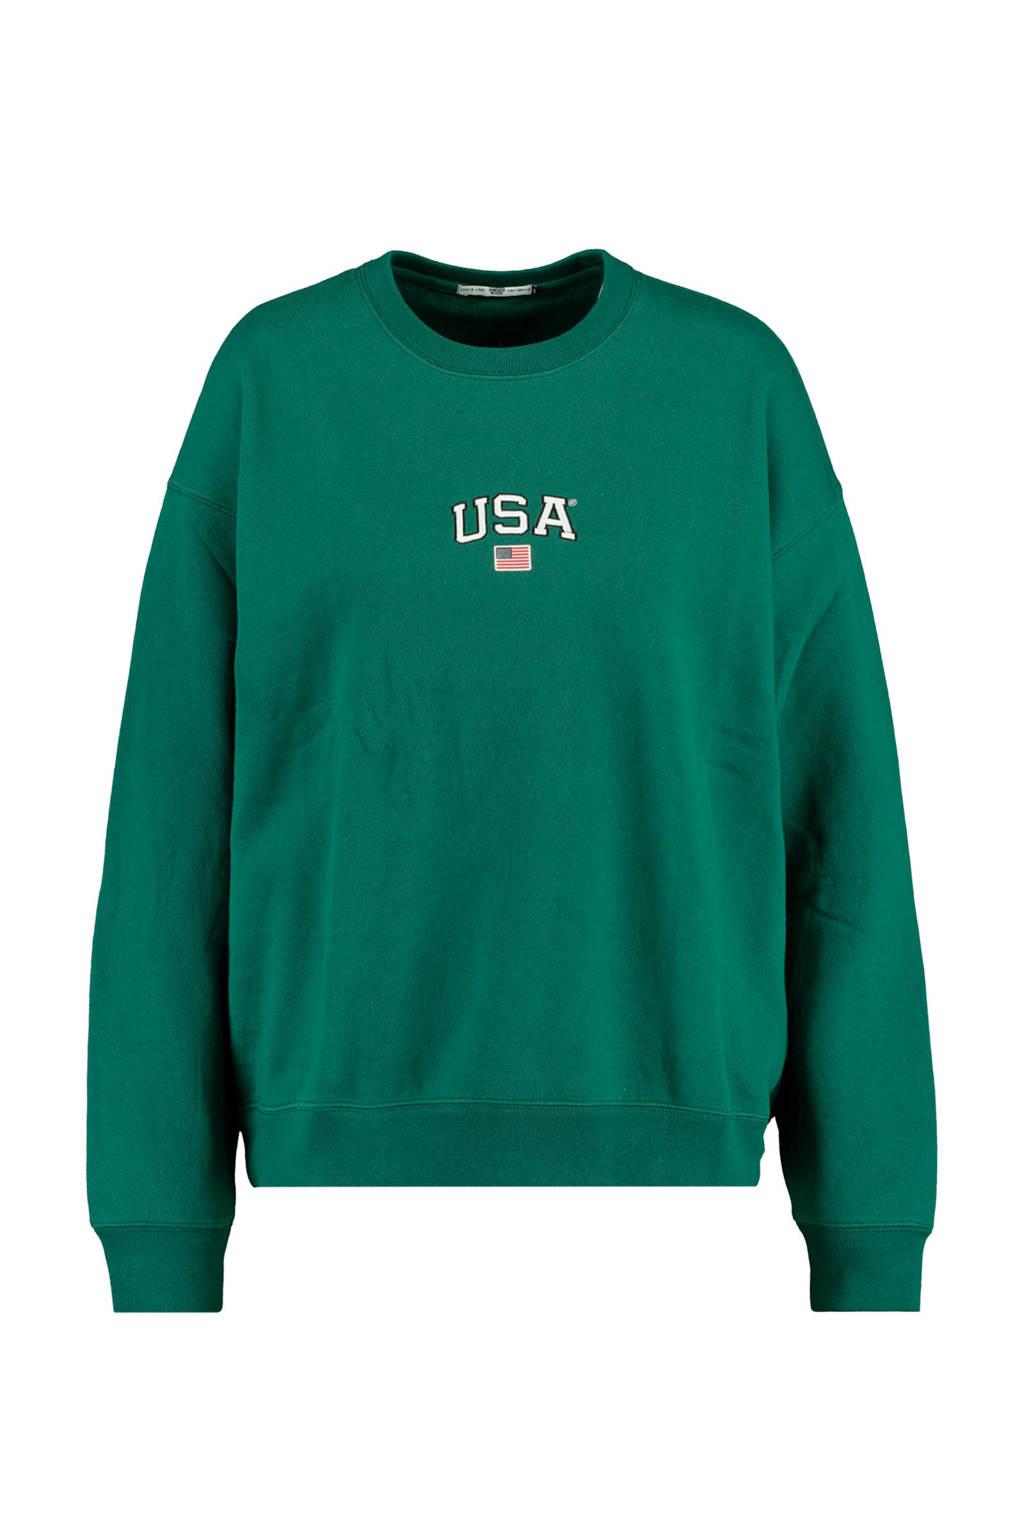 America Today sweater Sonny met tekst bottle green